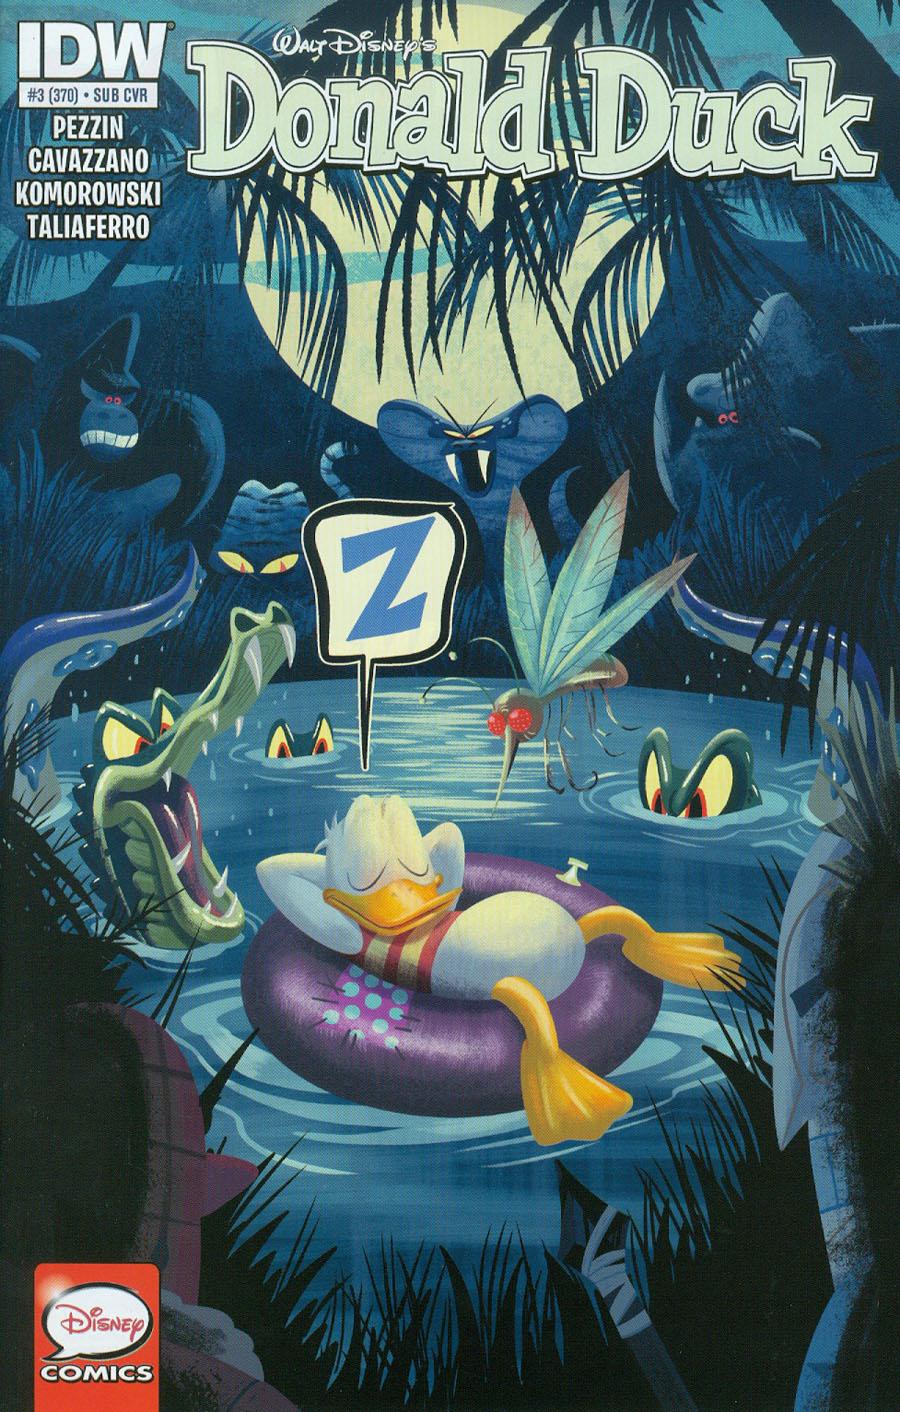 Donald Duck Vol 2 #3 Cover B Variant Derek Charm Subscription Cover